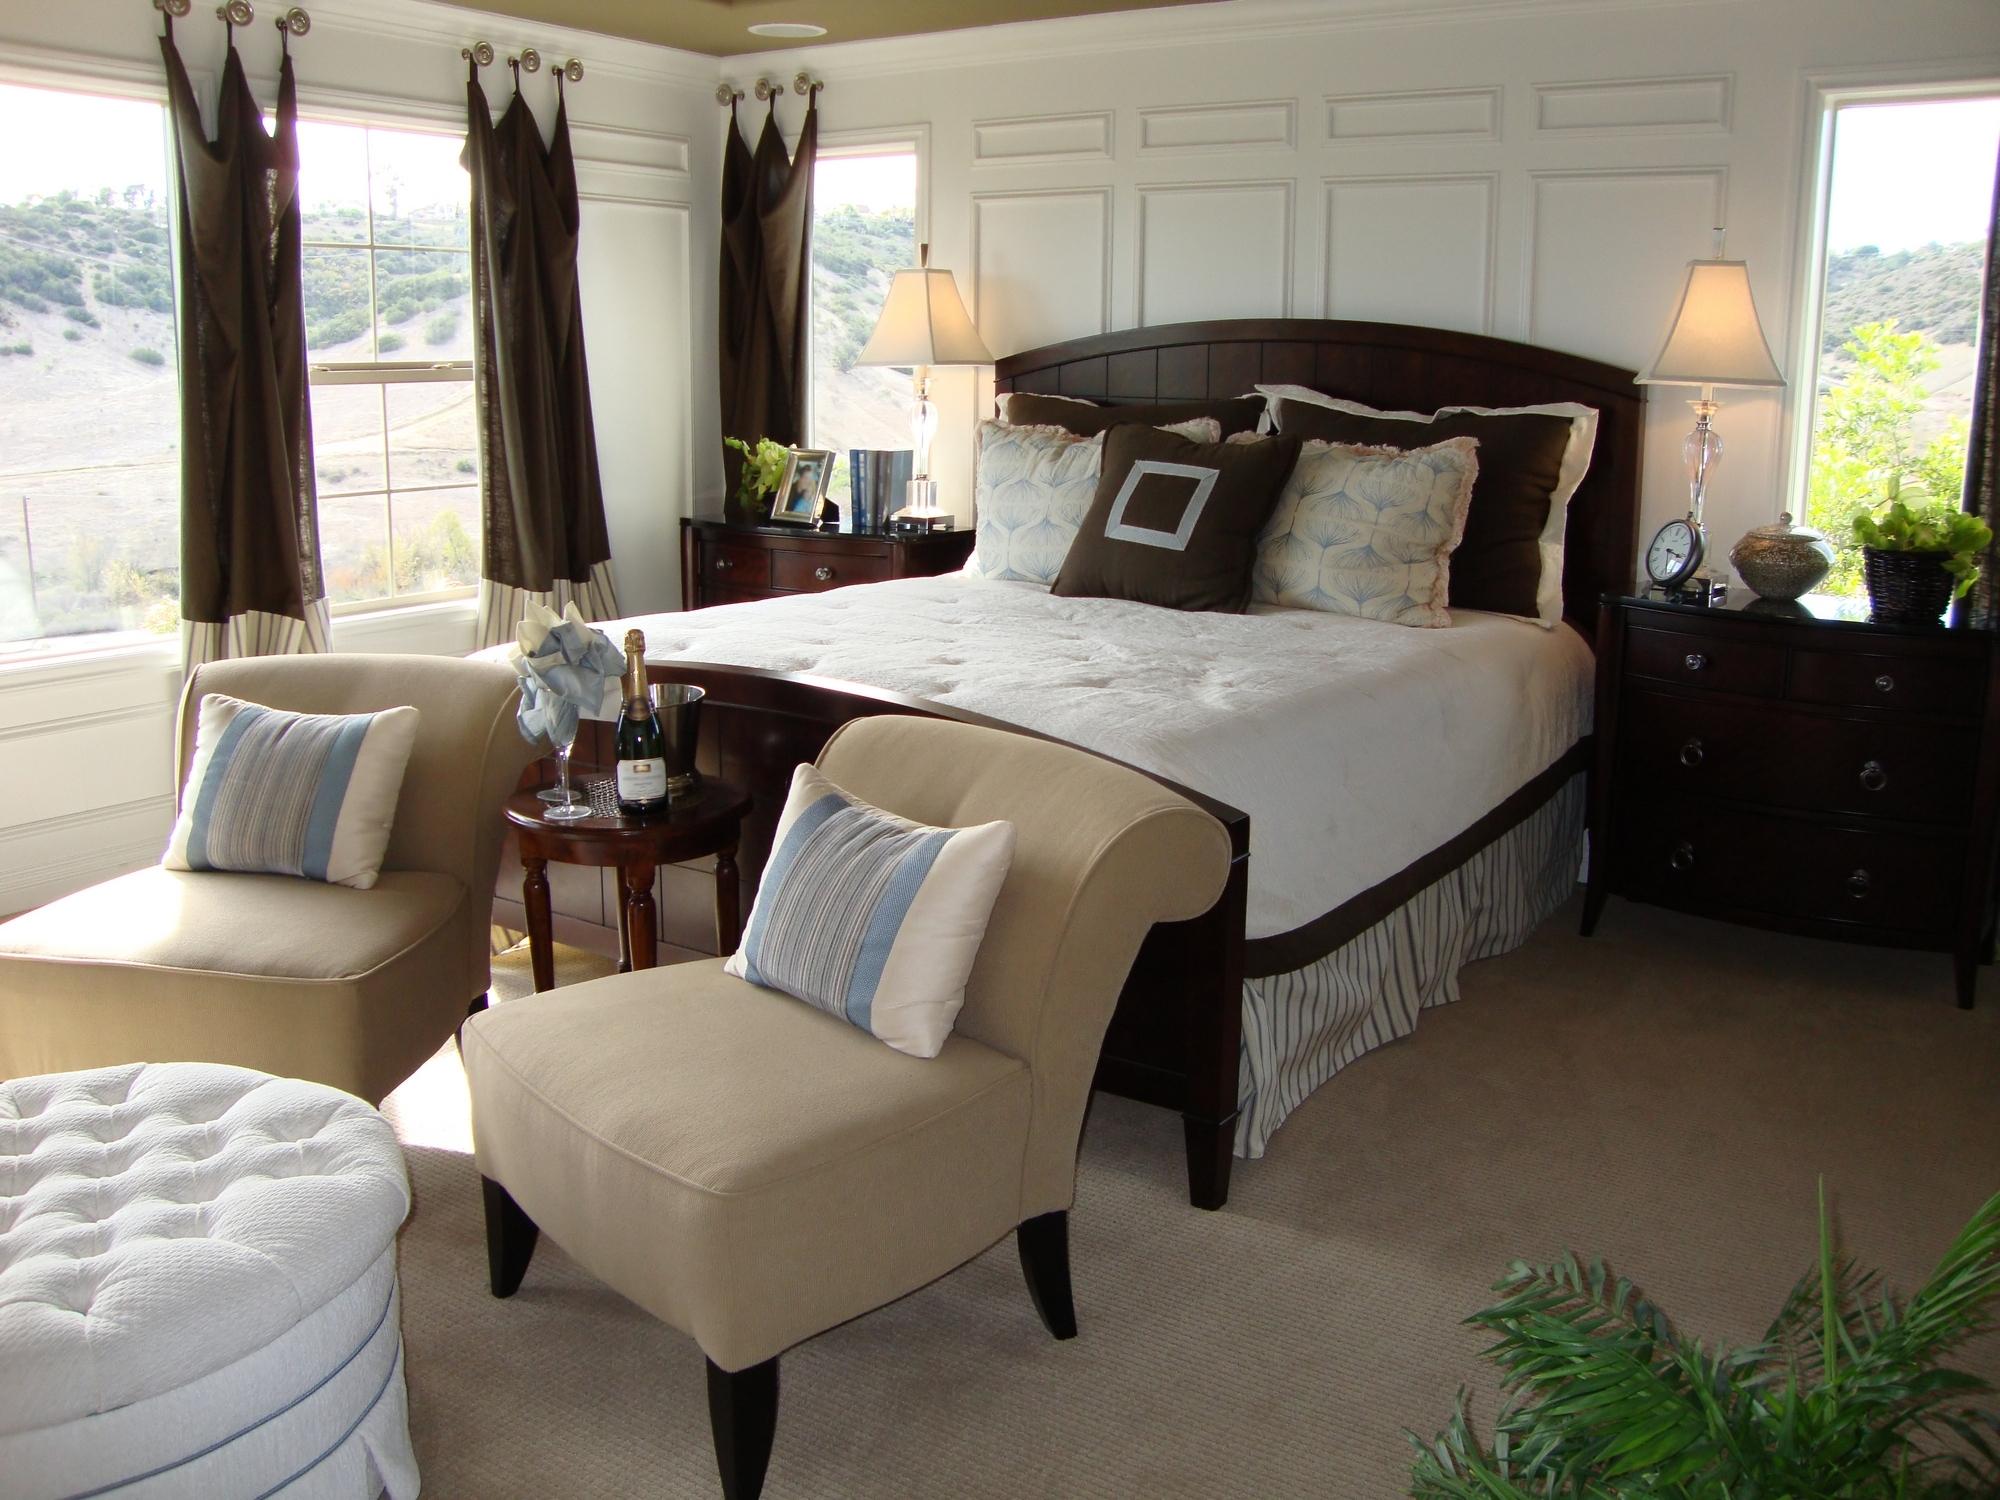 master bedroom furniture ideas photo - 7